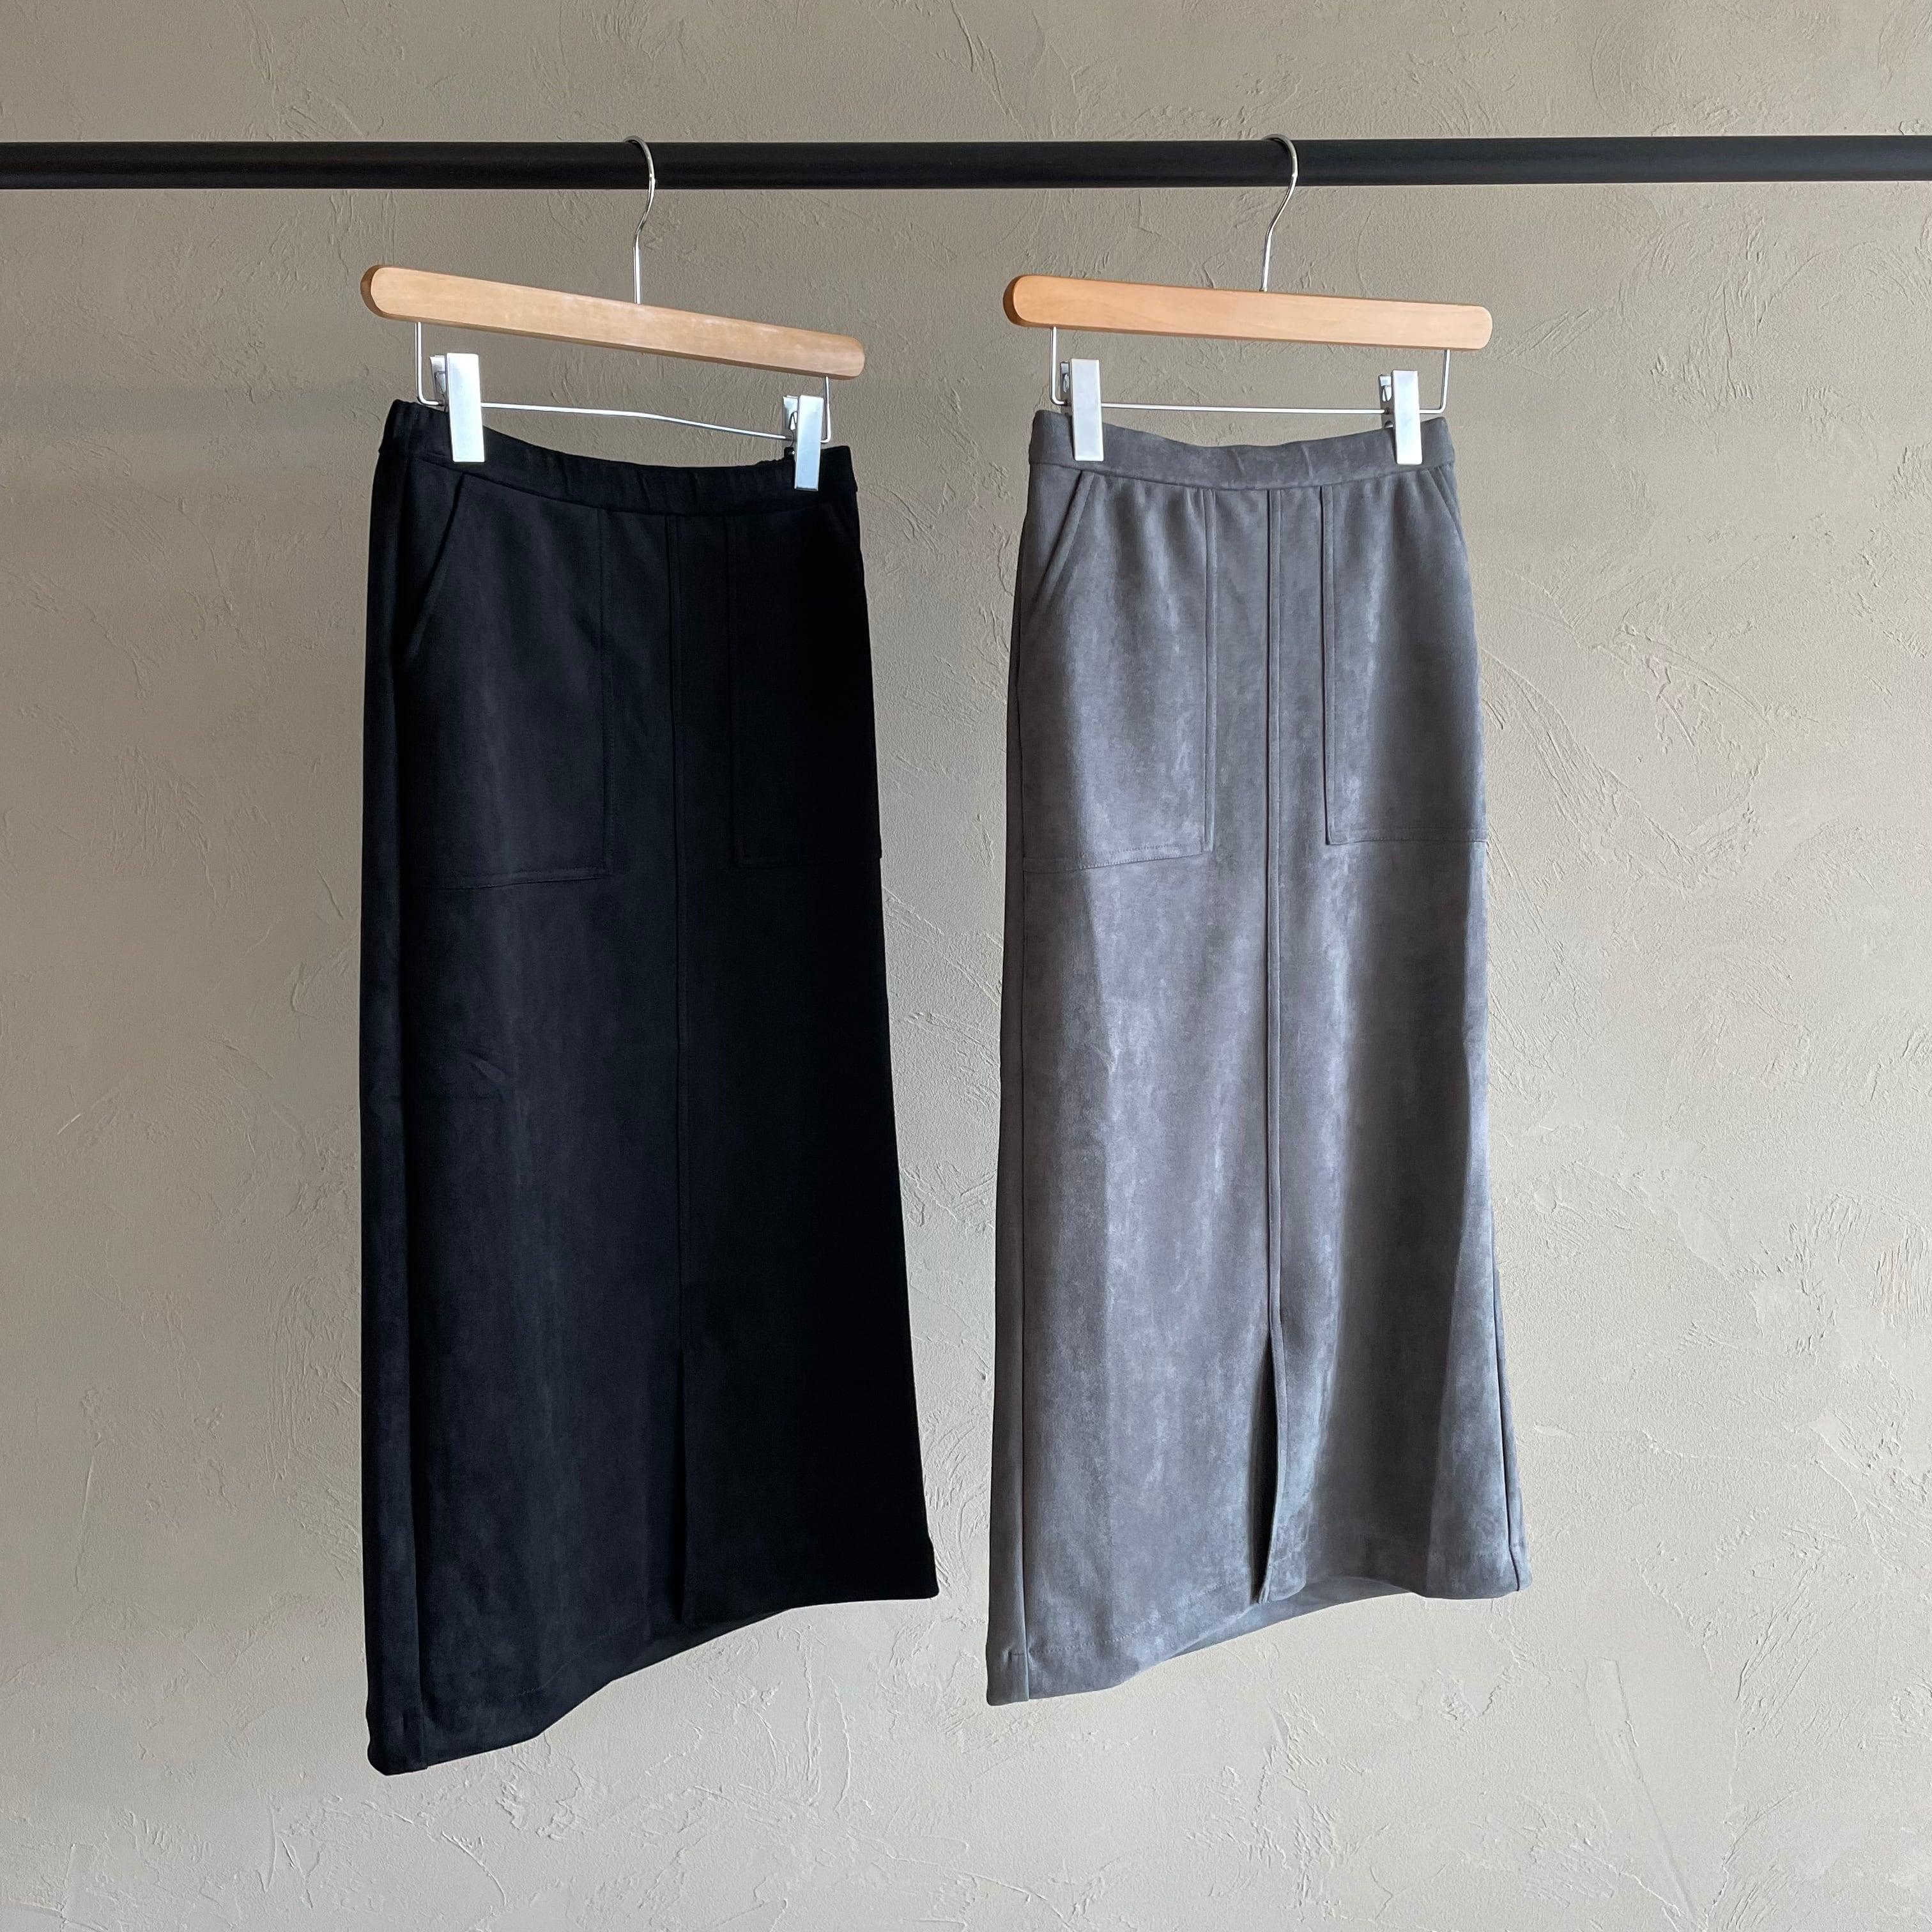 【 ROSIEE 】- R352733 - スウェードタイトスカート